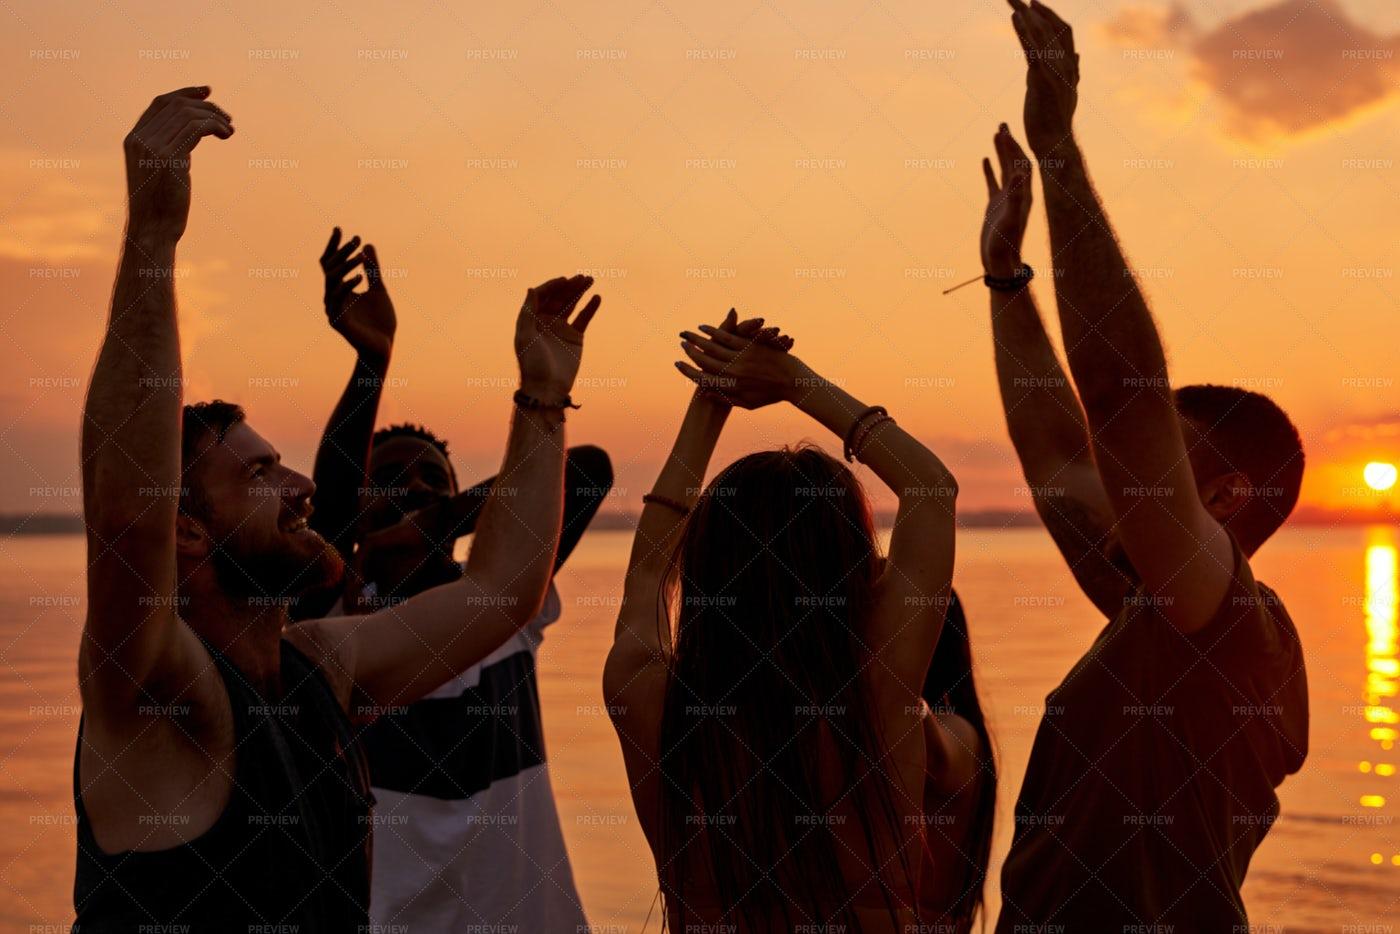 Ecstatic Young Students Enjoying...: Stock Photos